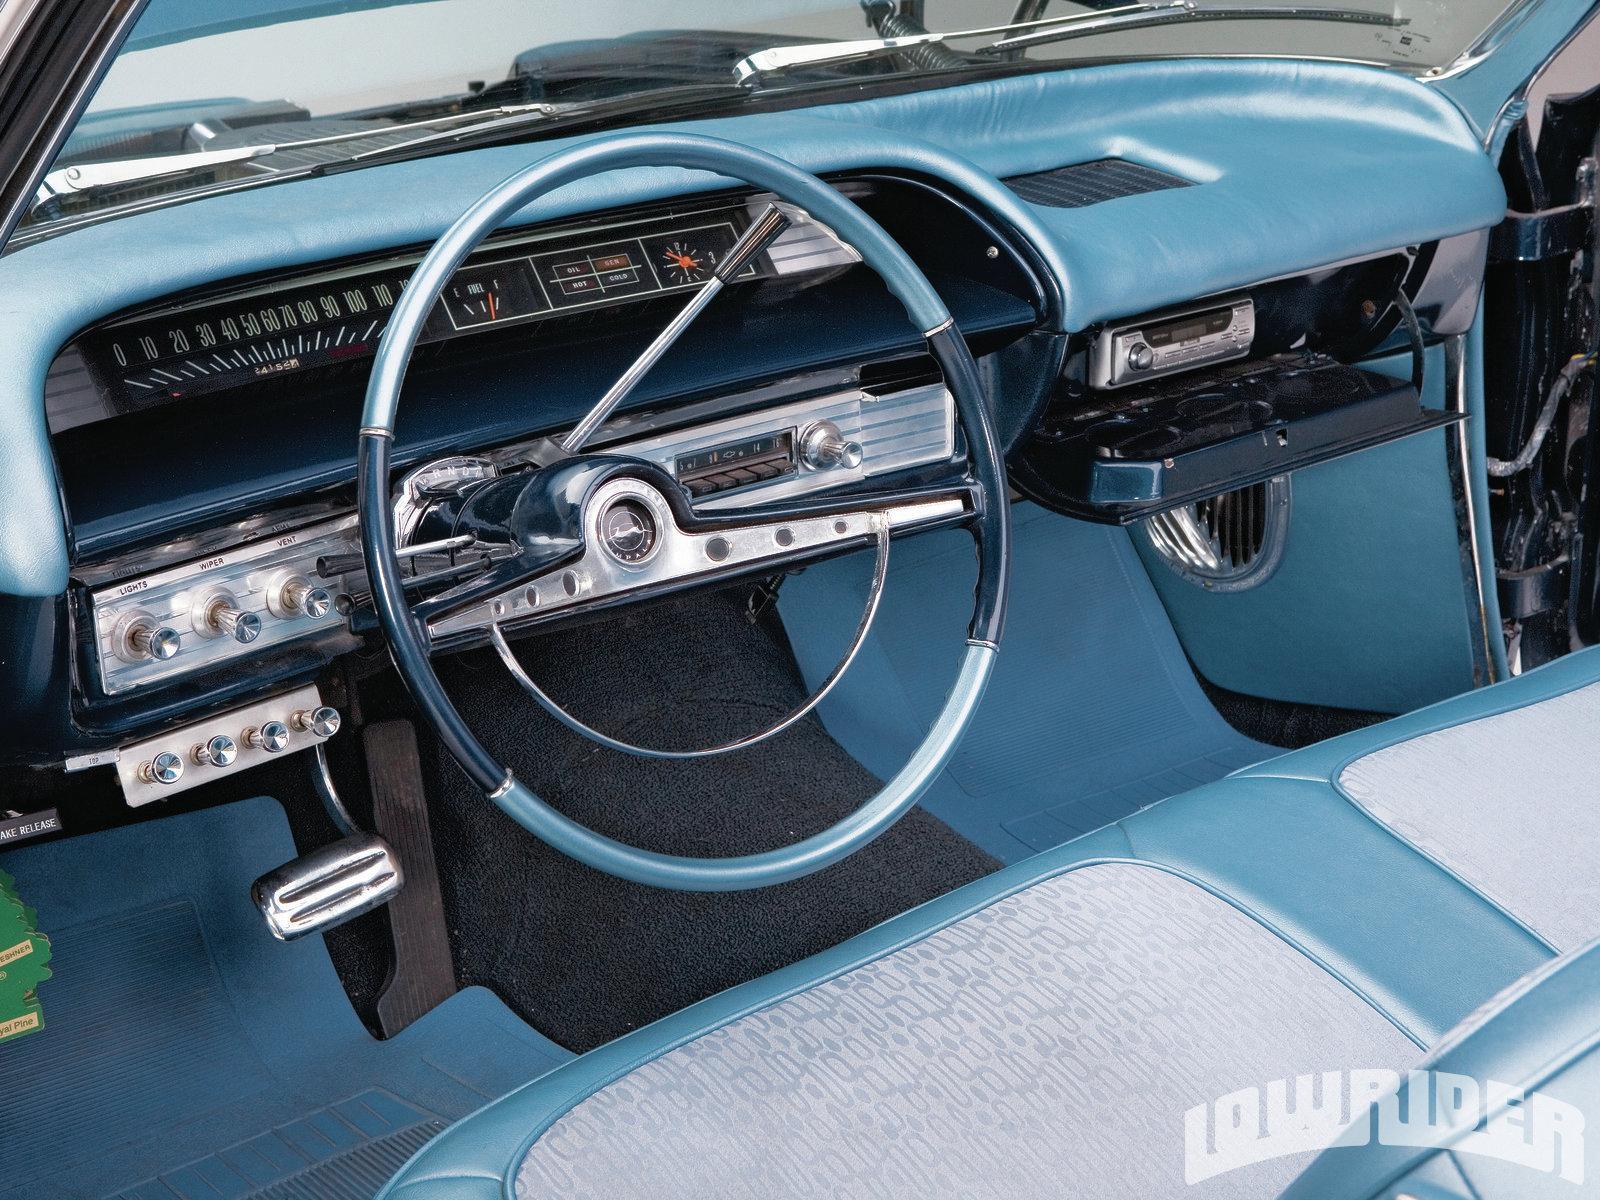 1963 Chevy Truck Craigslist >> 1963 Impala Parts Diagram : 25 Wiring Diagram Images - Wiring Diagrams | Sewacar.co